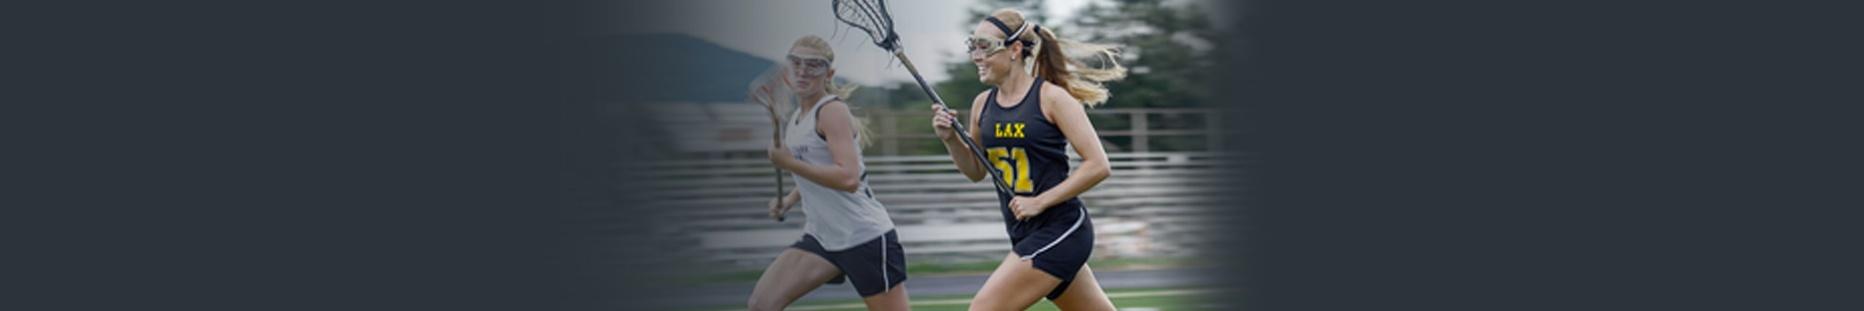 Lacrosse Determination